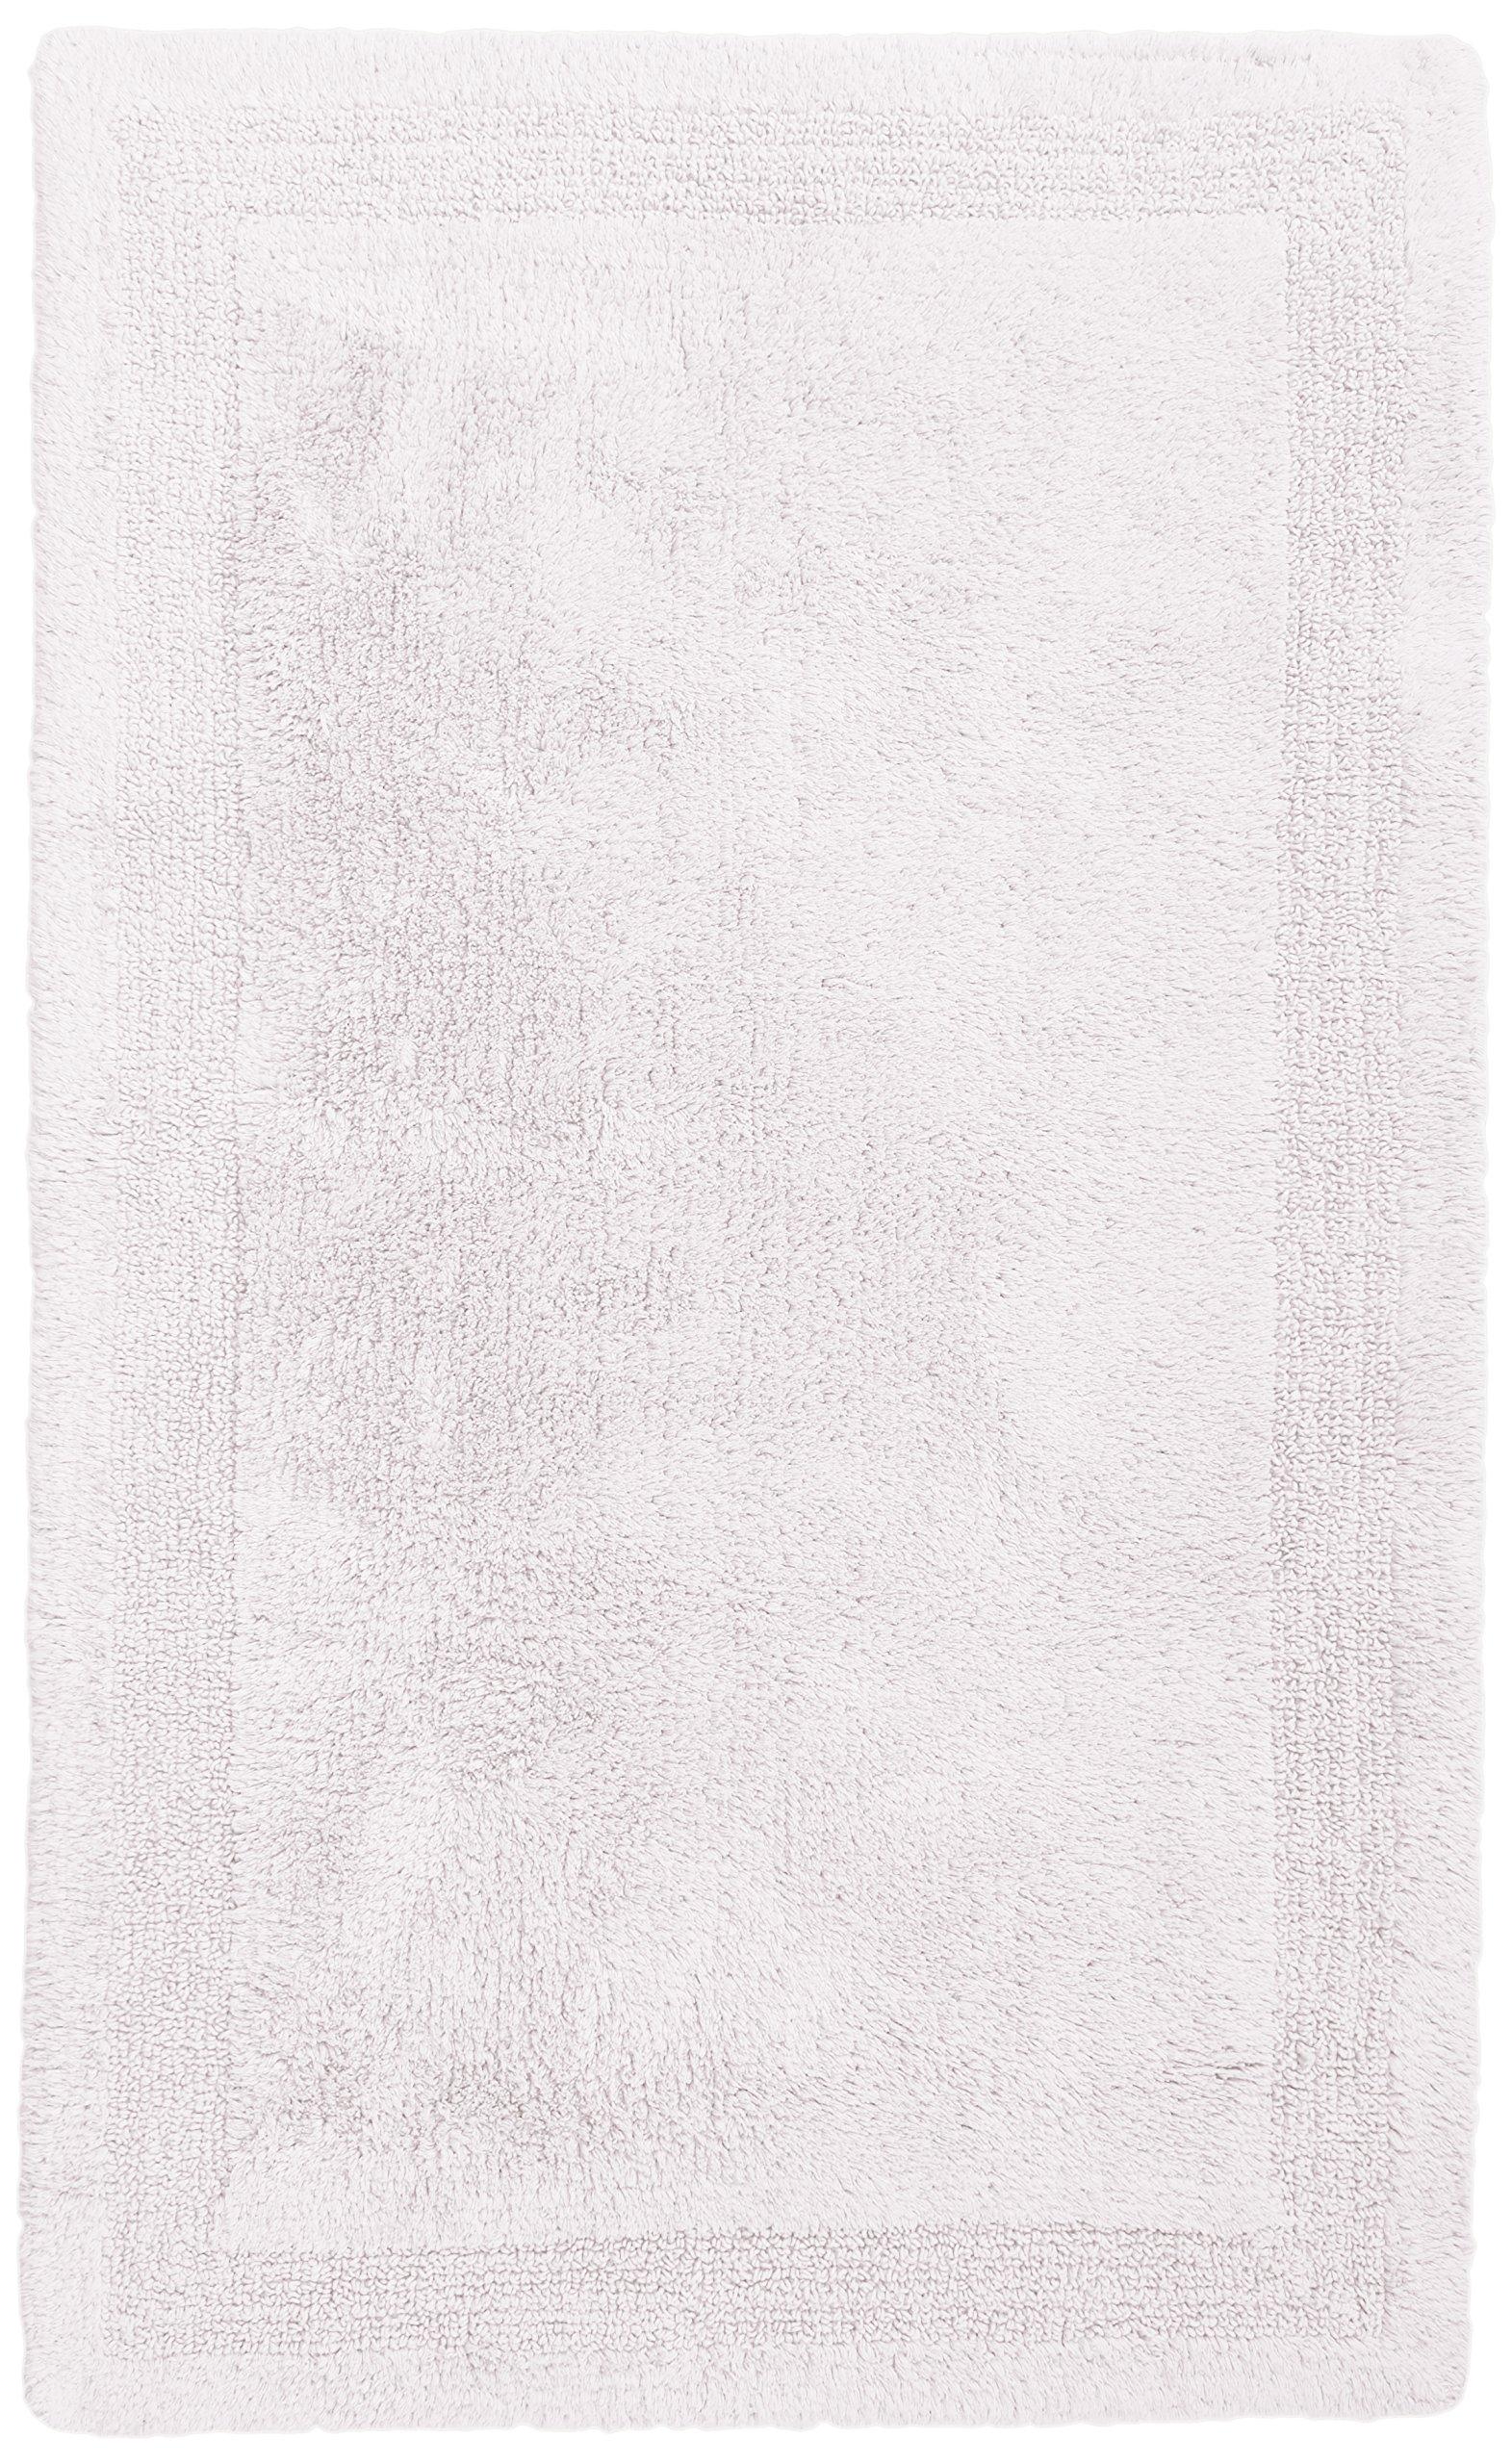 Reversible Cotton Bath Rugs: Amazon.com